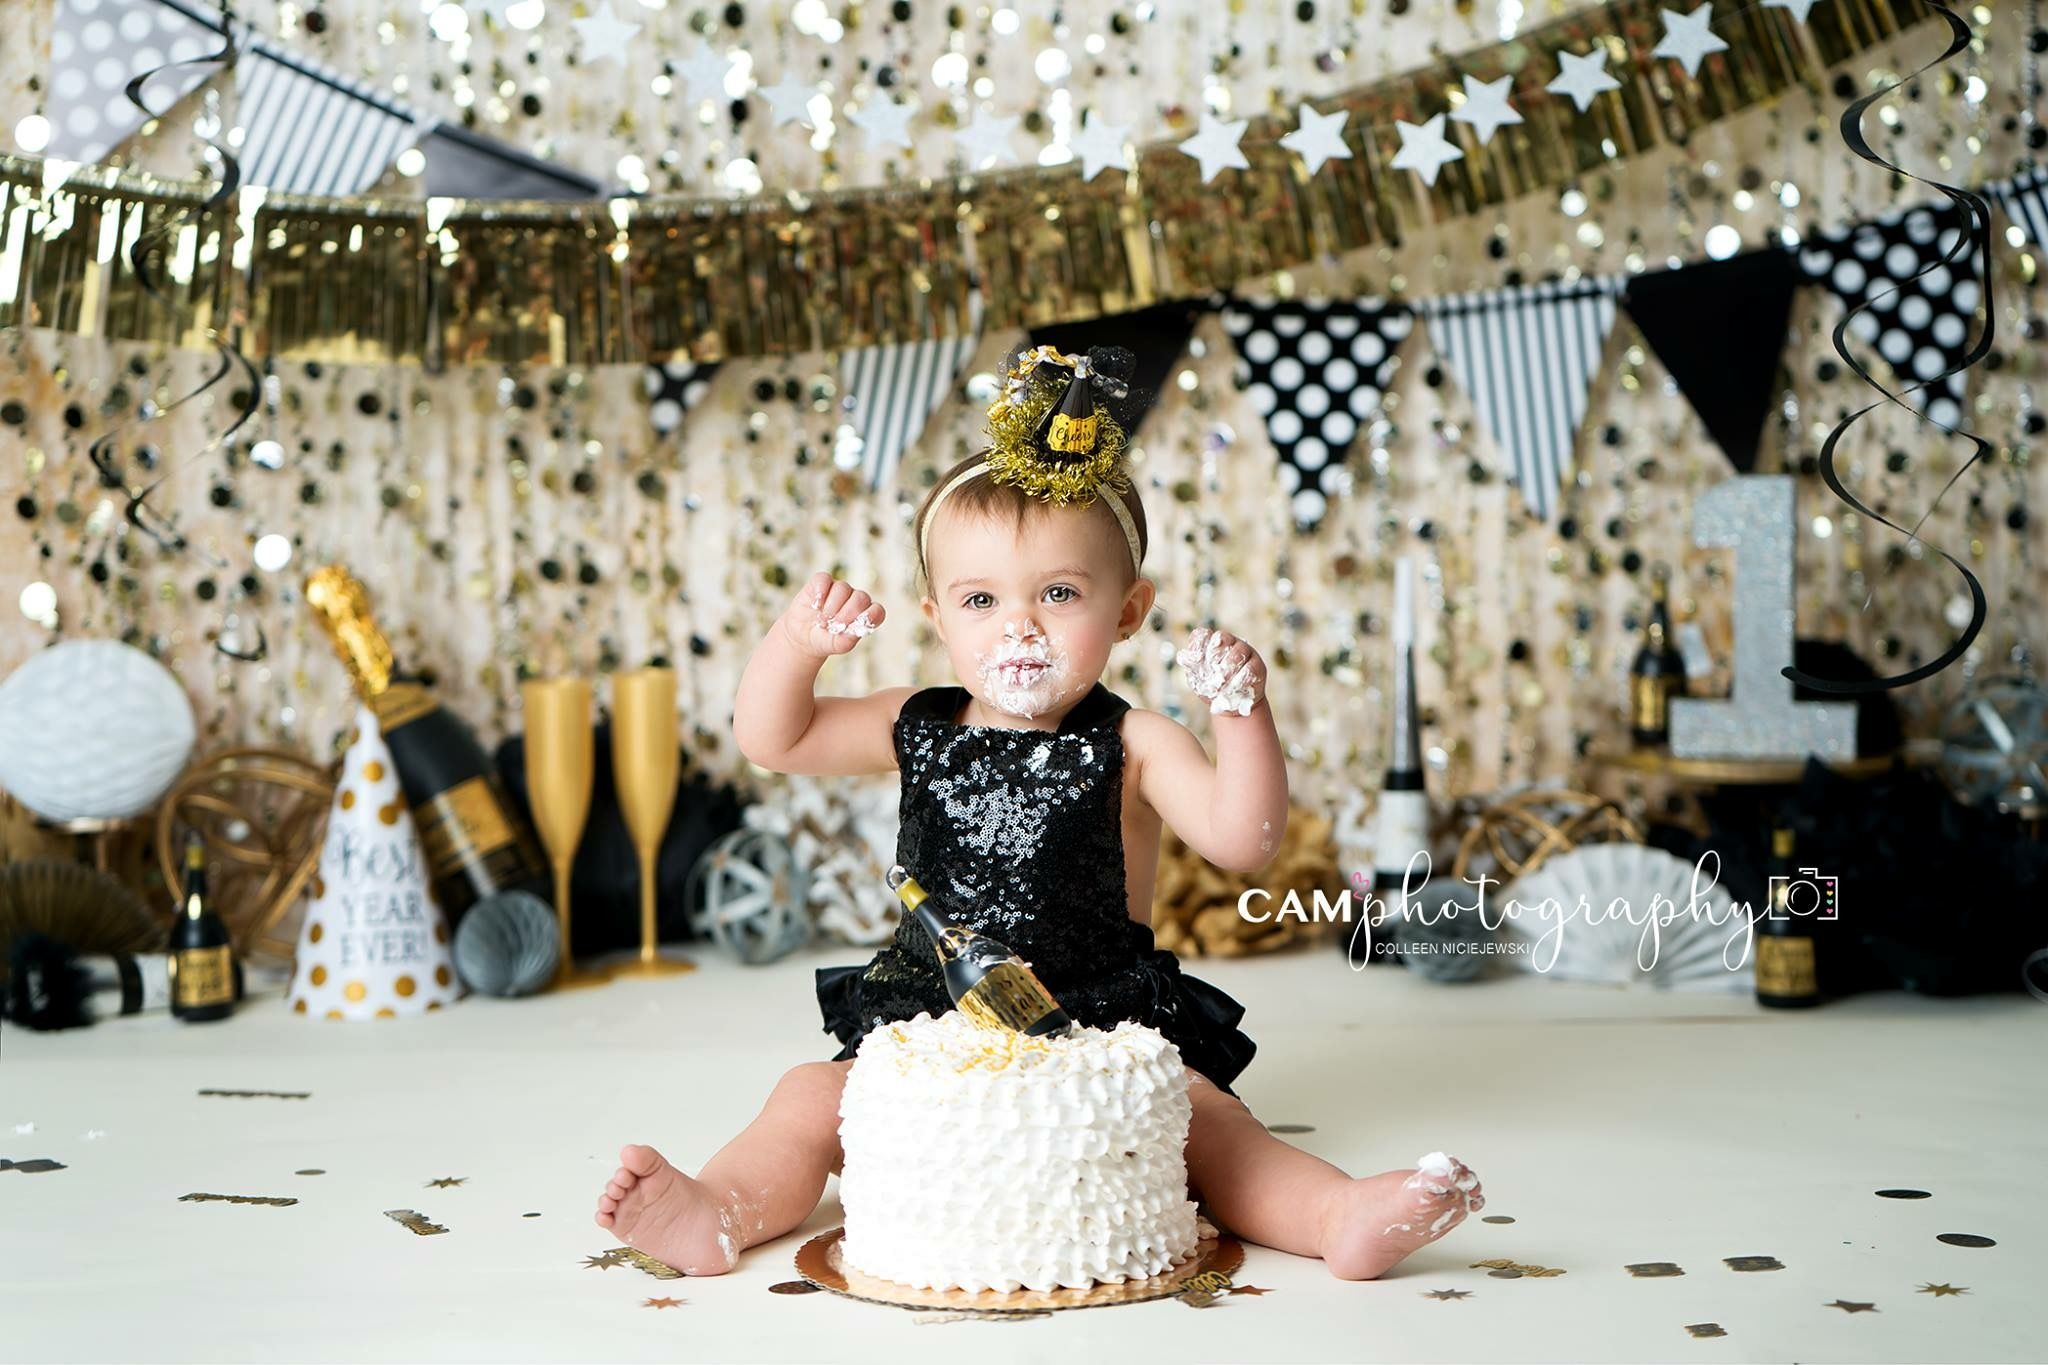 New Year New Me New Year S Cake Smash Smashcake Birthday Photos Photoshoot Smas Birthday Party Photography New Years Eve Birthday Party 1st Boy Birthday